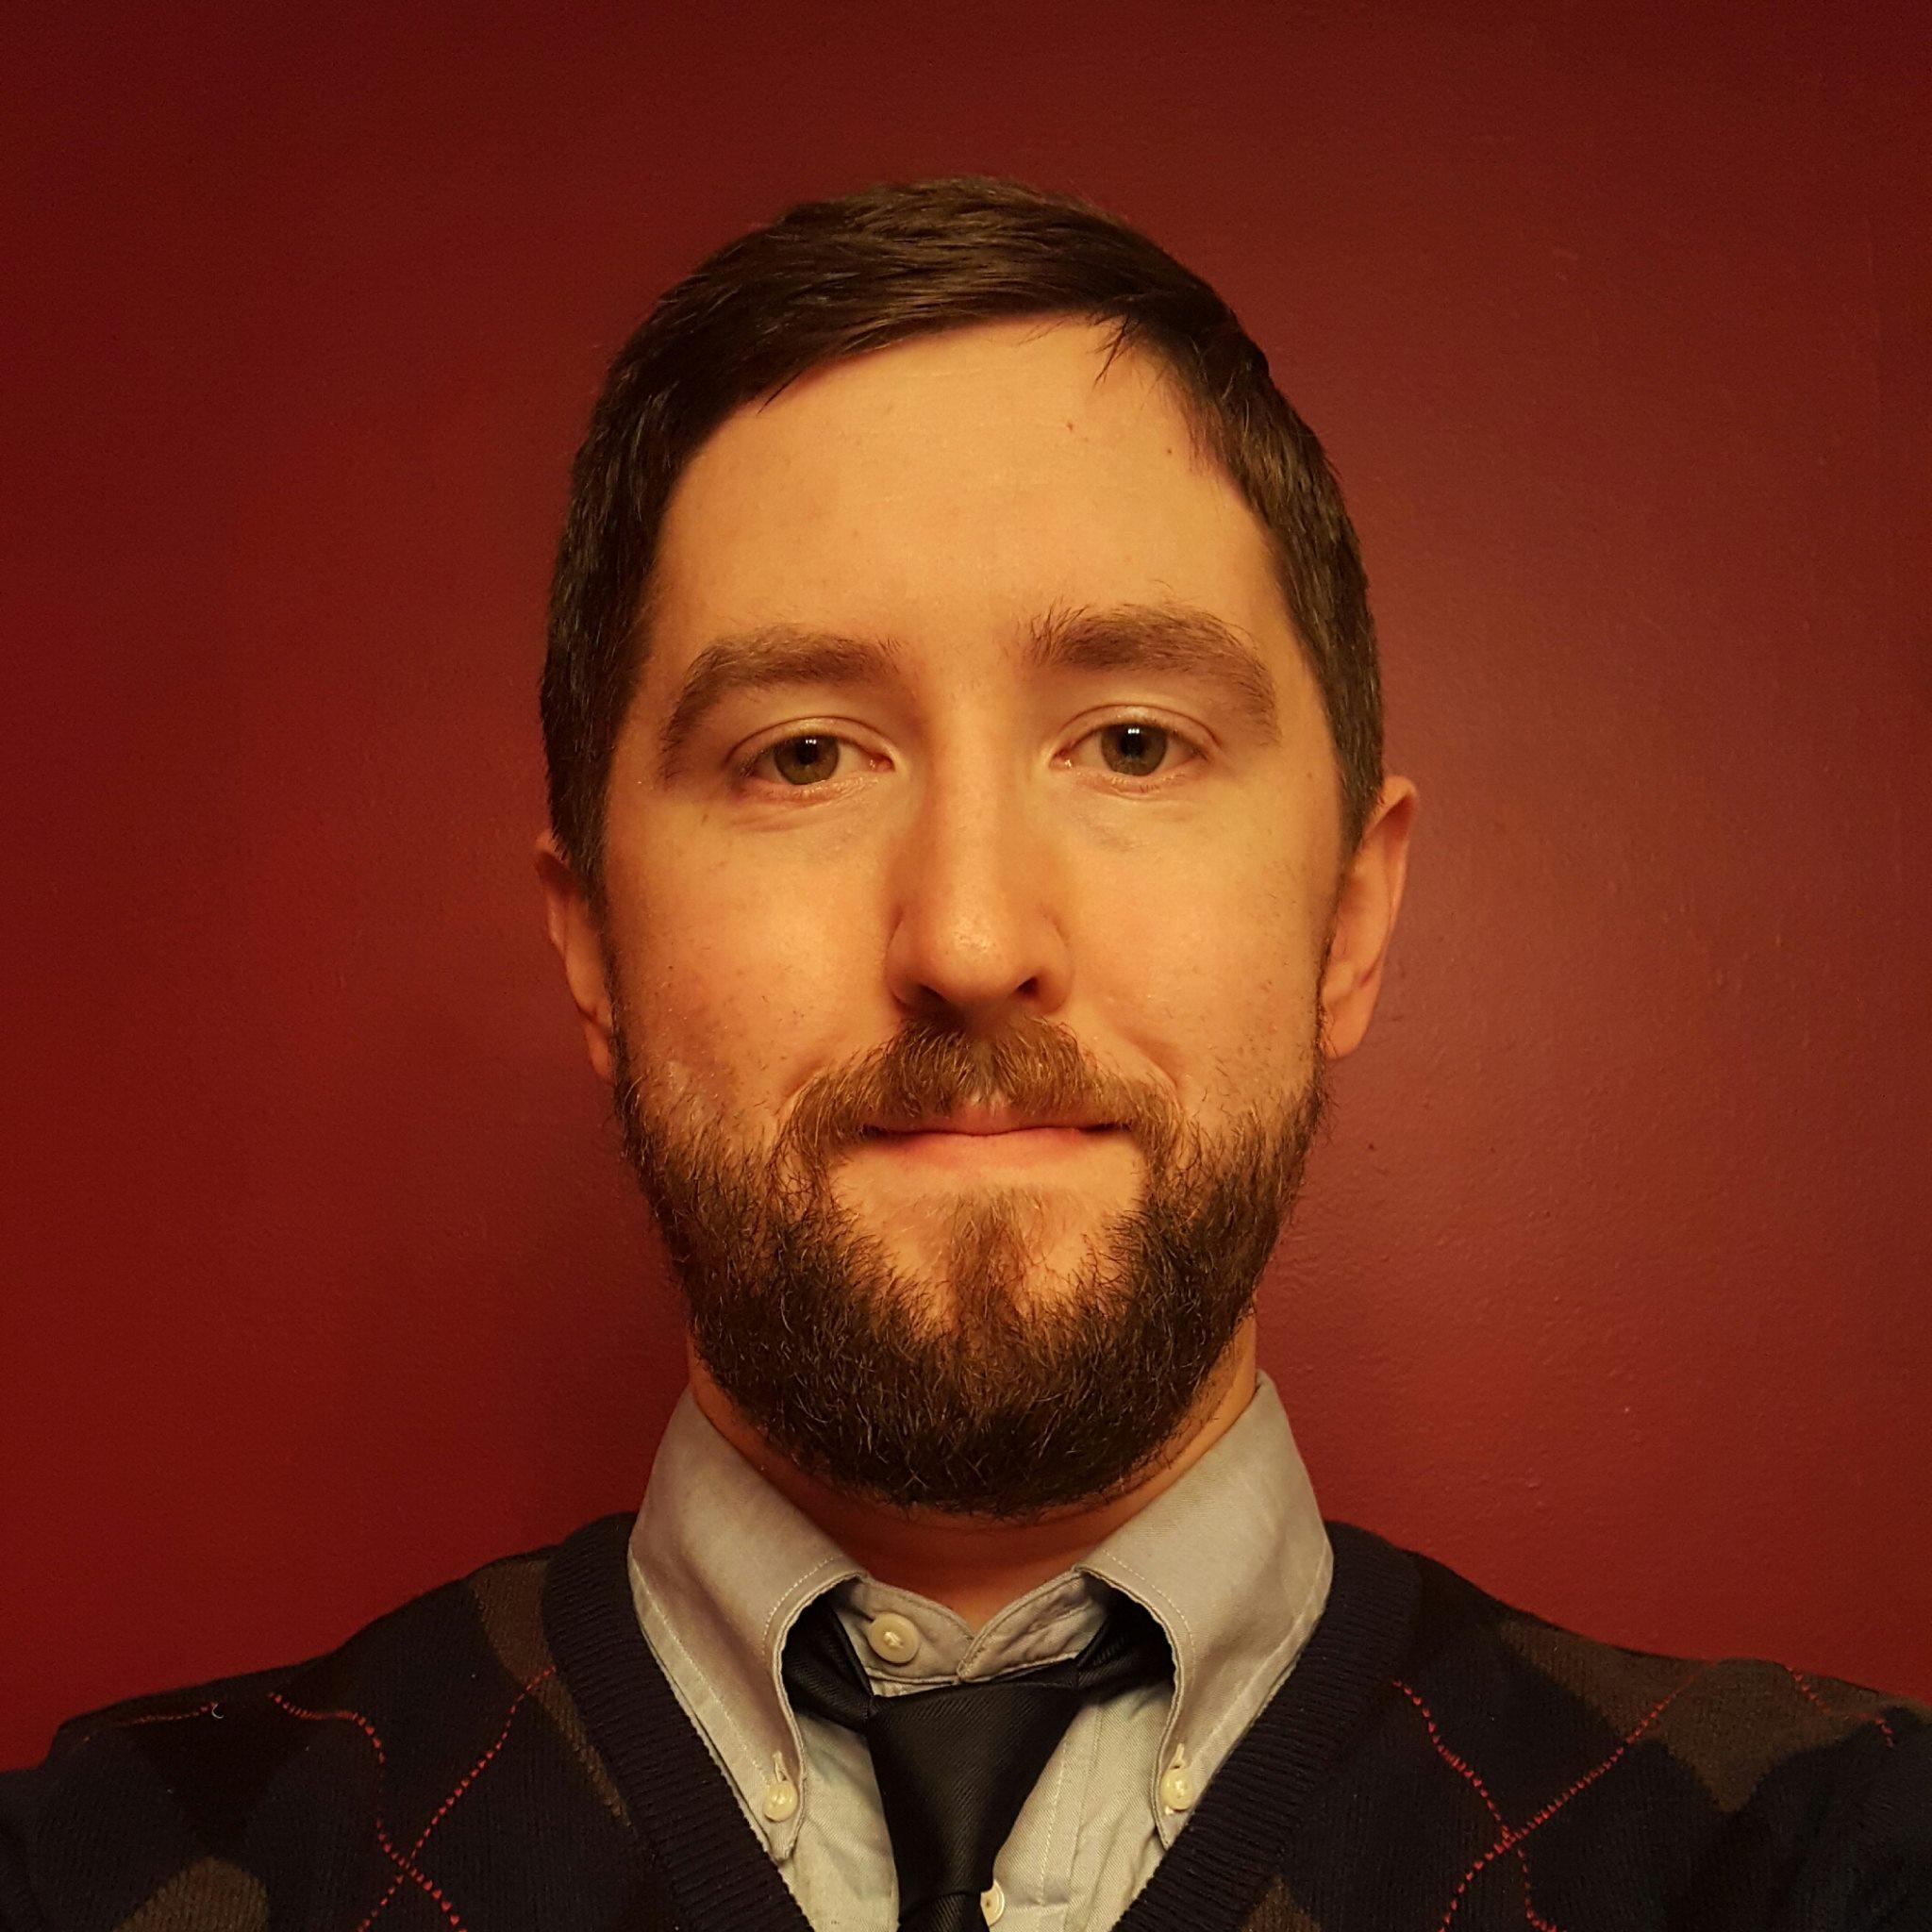 Dan Getz, host of The Crash & Burn Cafe